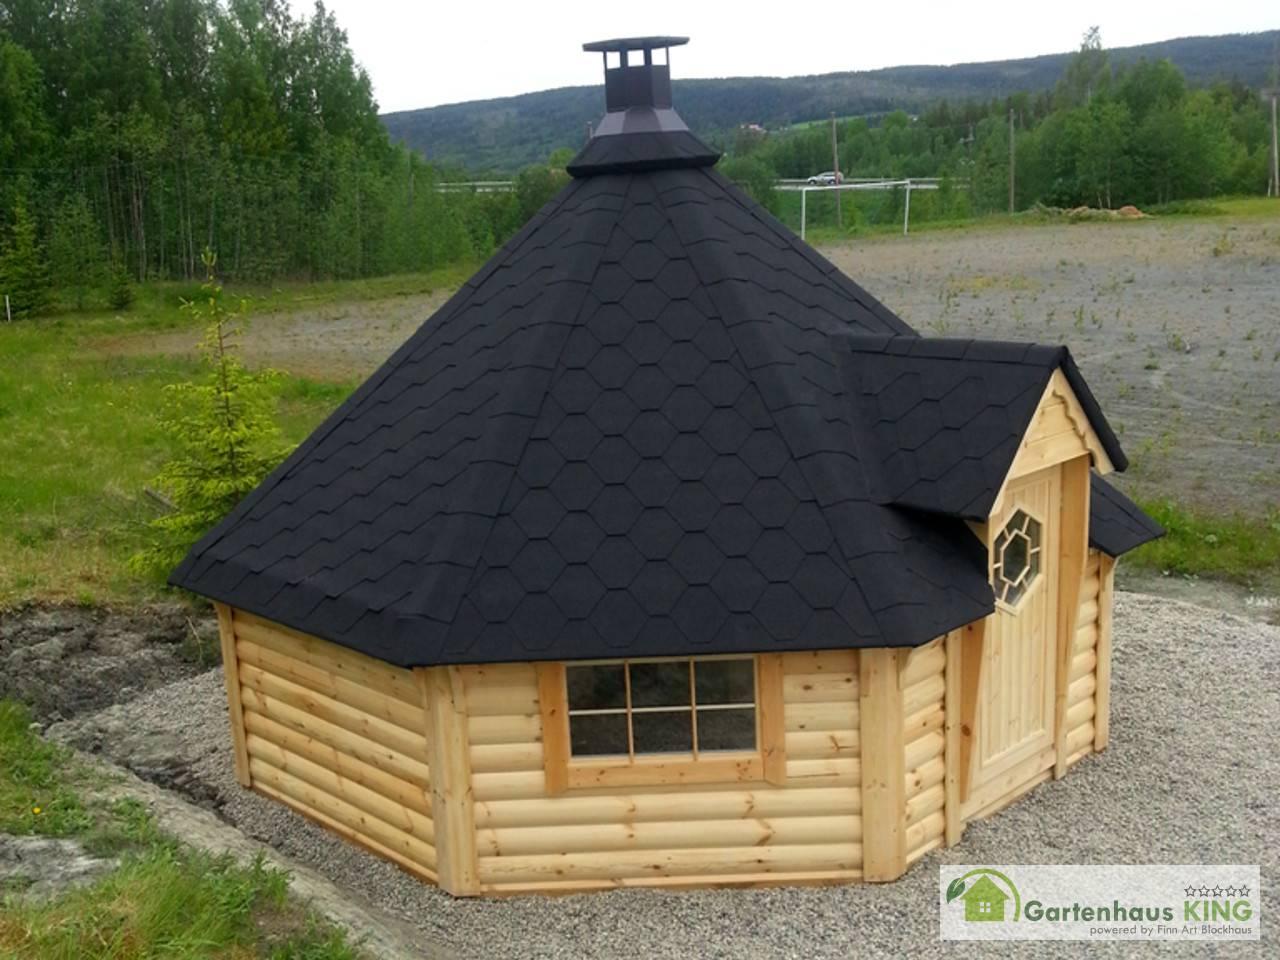 finn art grillkota elegance 16 5 m gartenhaus. Black Bedroom Furniture Sets. Home Design Ideas